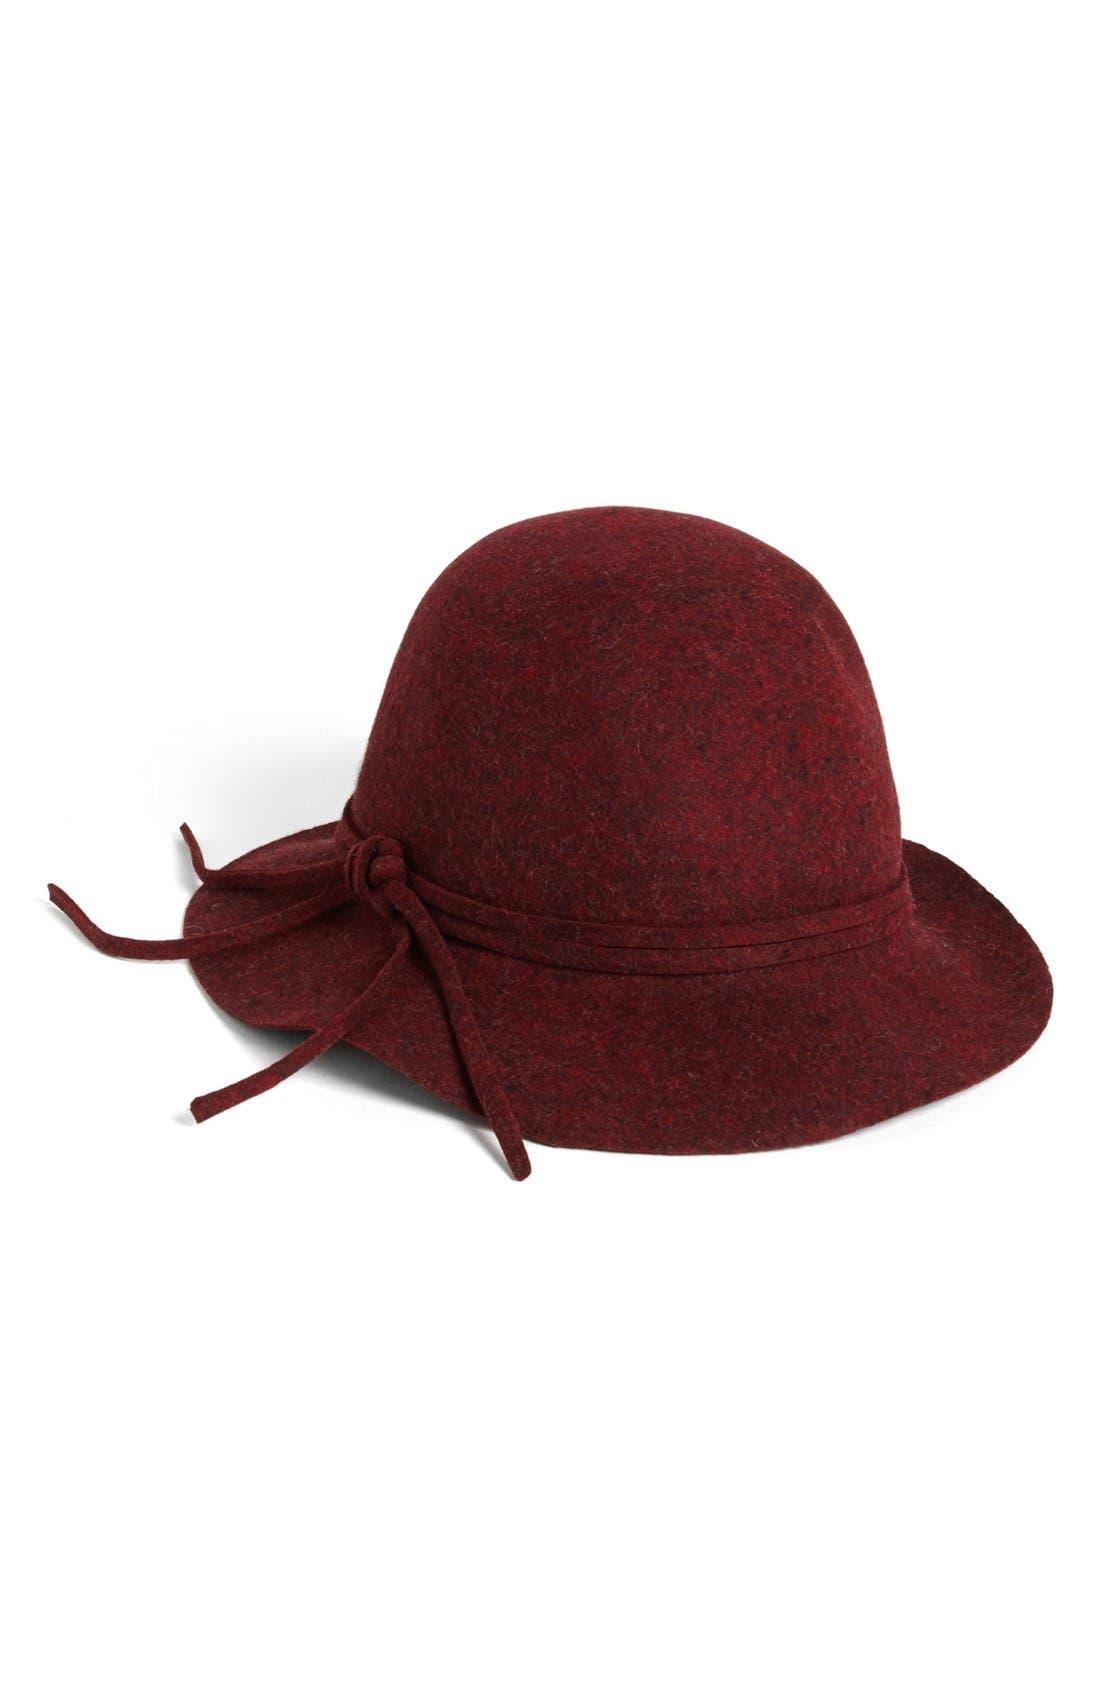 Main Image - Nordstrom Felt Hat